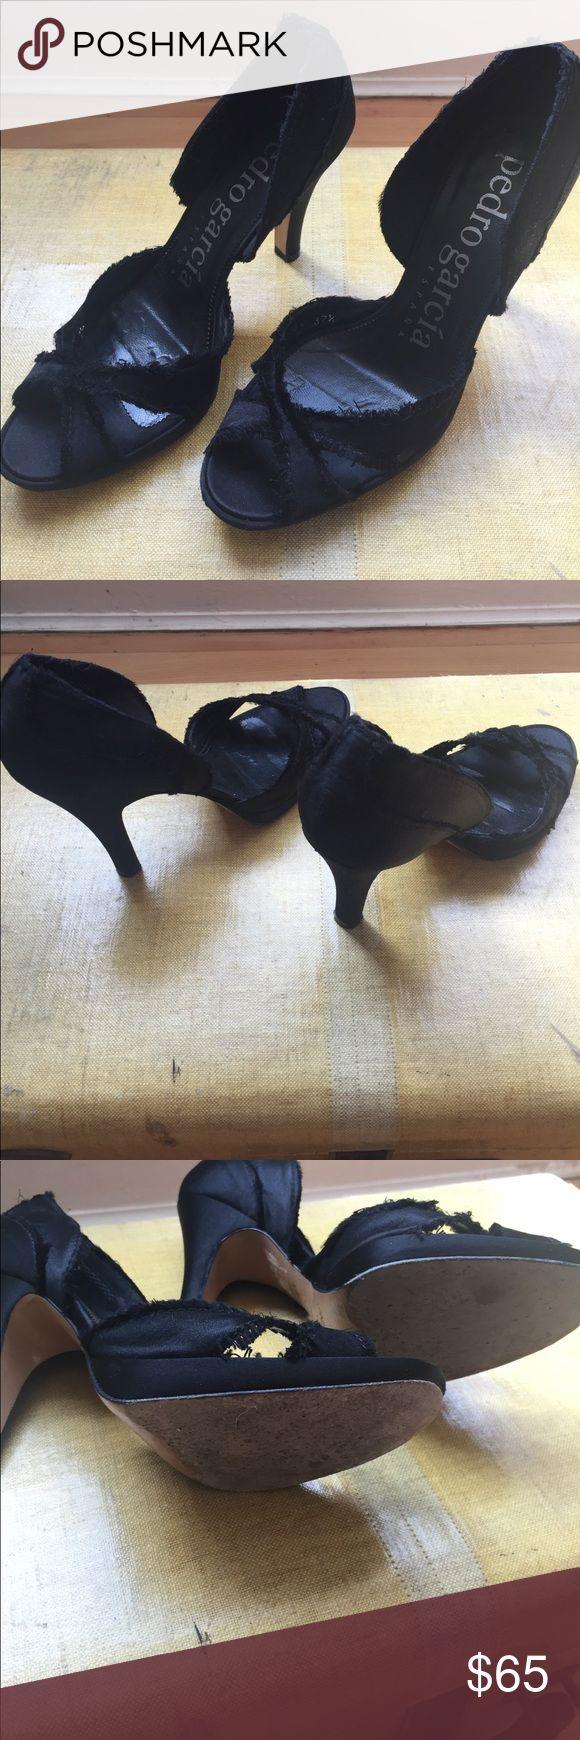 Black Satin Pedro Garcia Heels Frayed black satin Pedro Garcia Delores Heels. Ships w original box and dust bag. Pedro García Shoes Heels